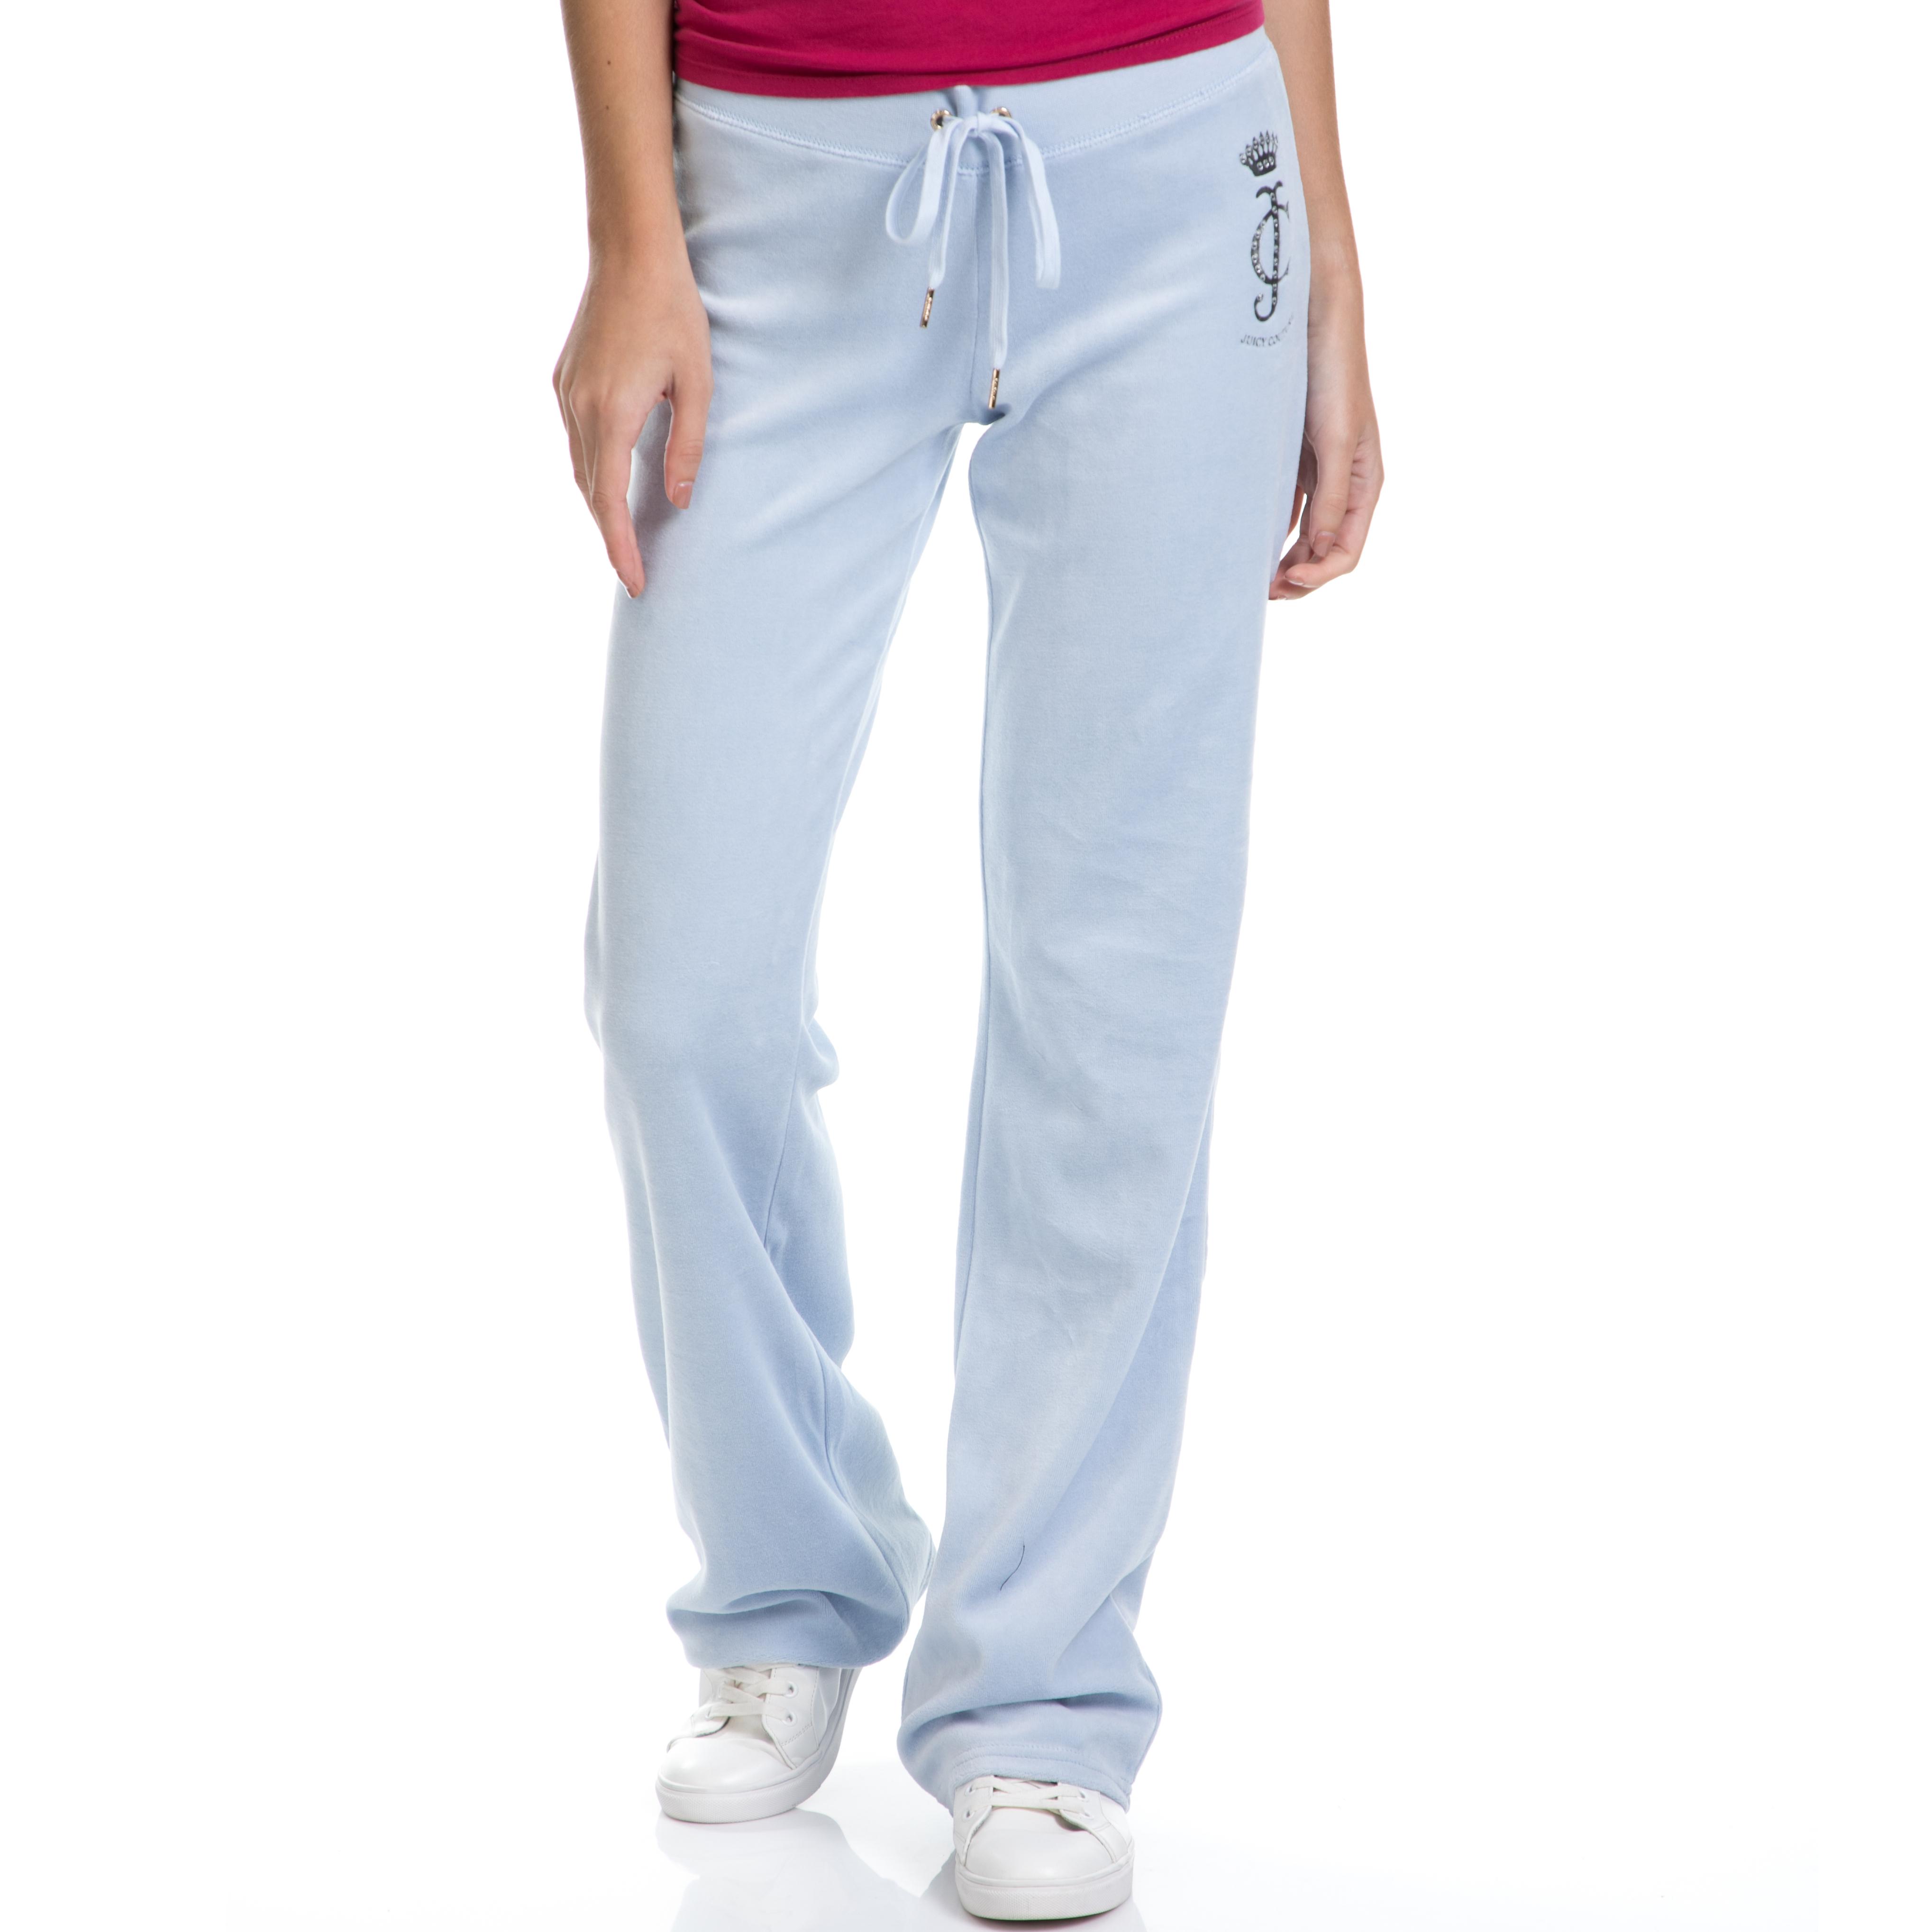 JUICY COUTURE – Γυναικεία φόρμα LOGO VLR STARBURST CAMEO γαλάζια